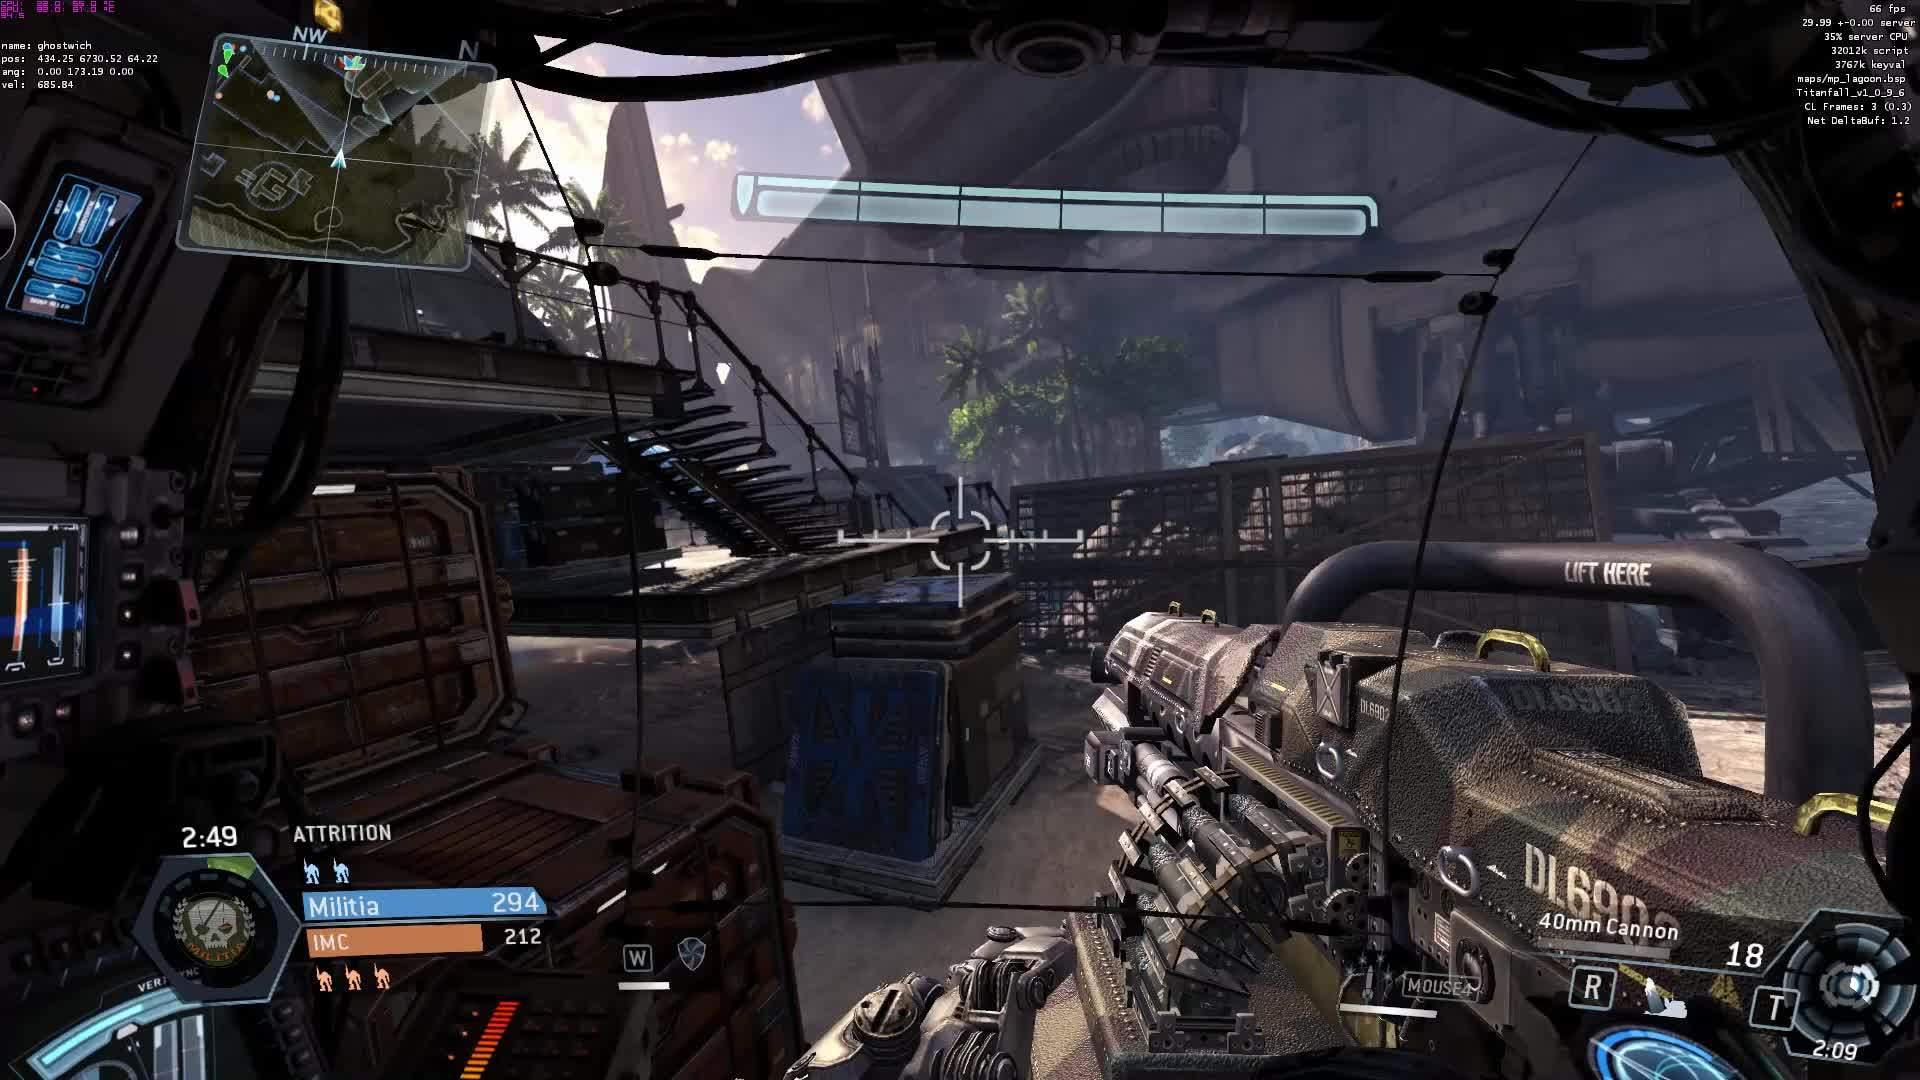 60fpsgaminggifs, [Titanfall] Return to sender GIFs